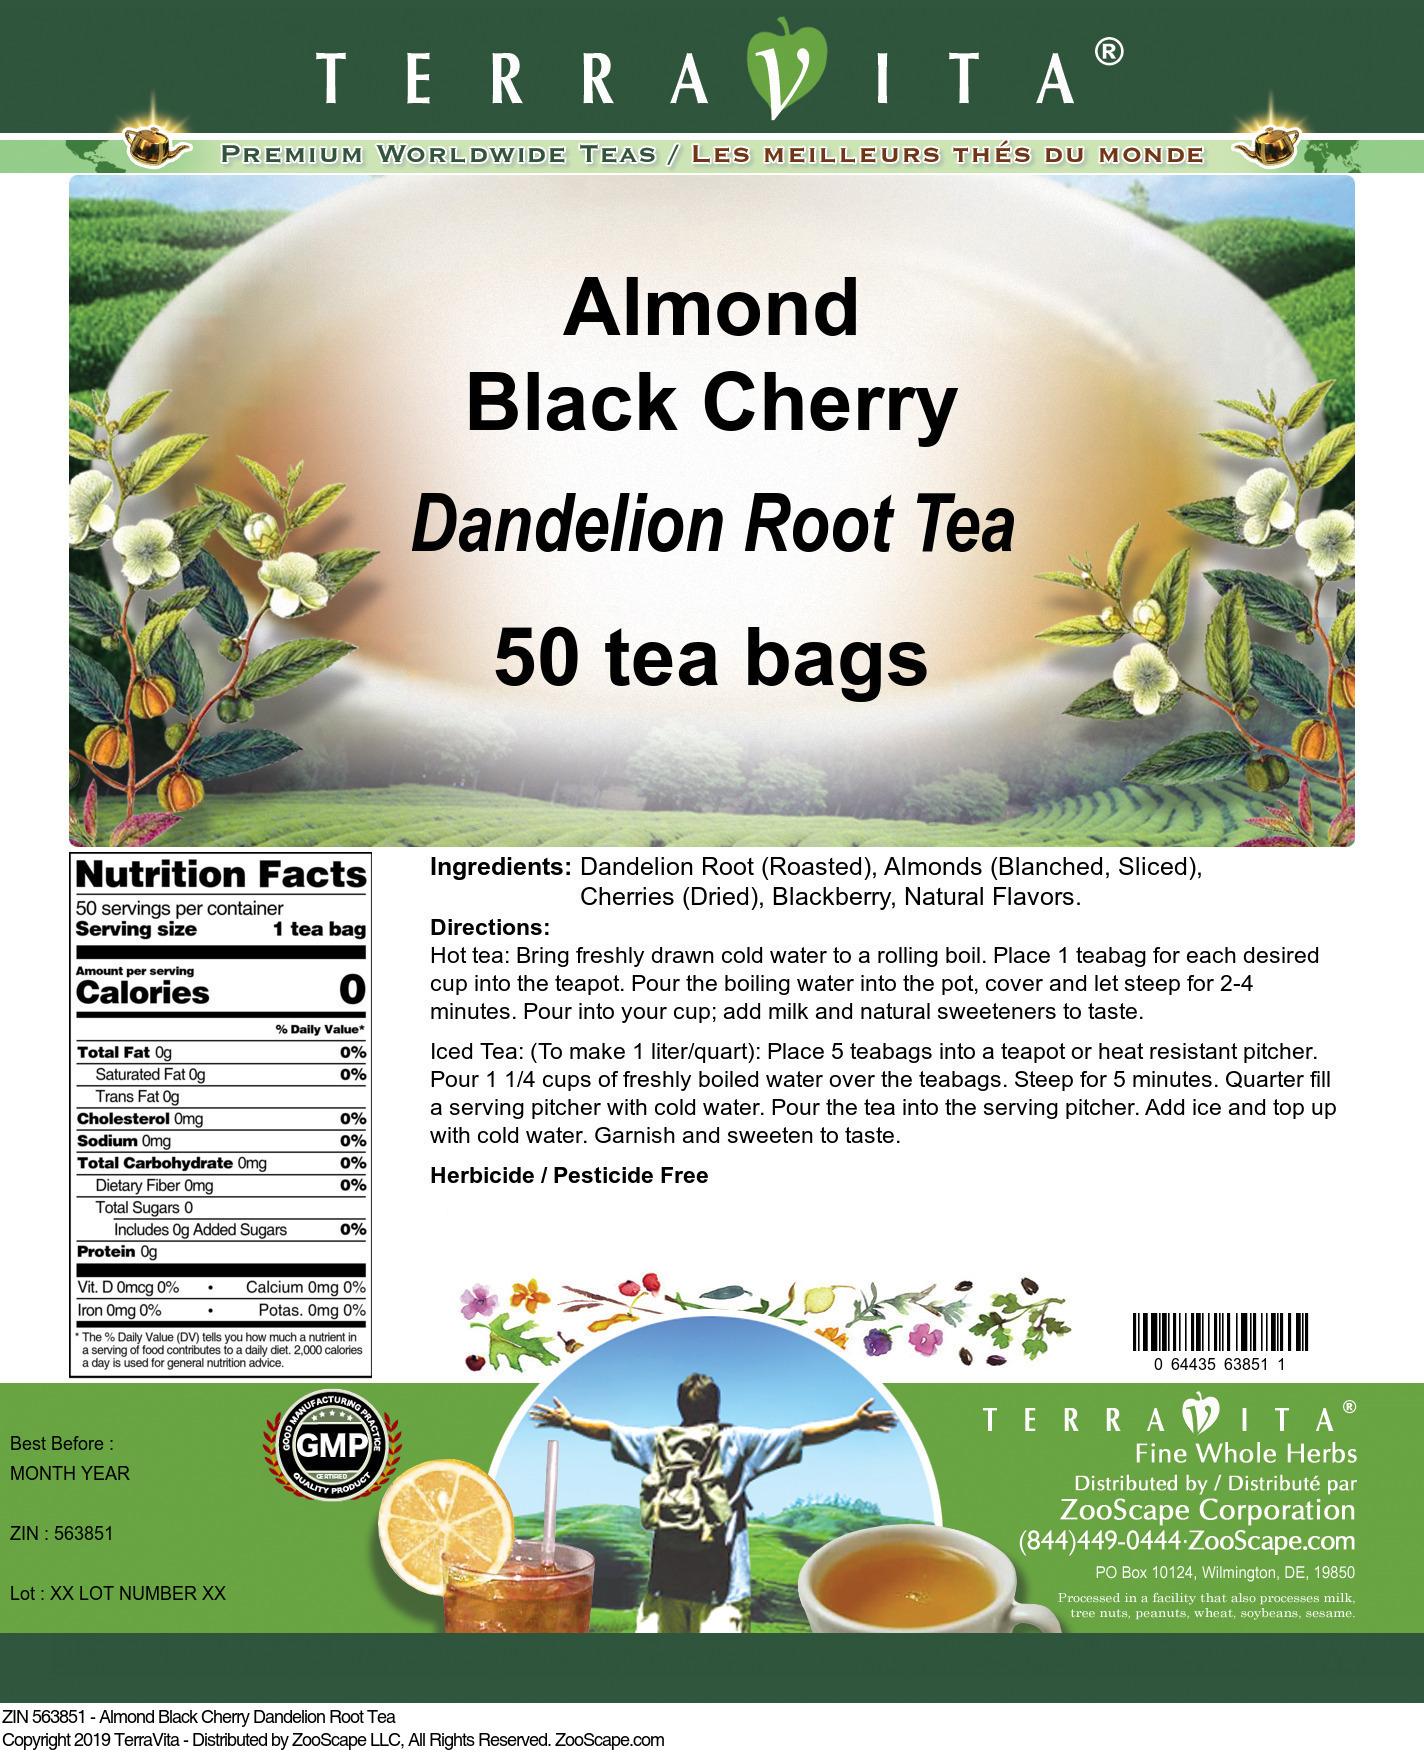 Almond Black Cherry Dandelion Root Tea